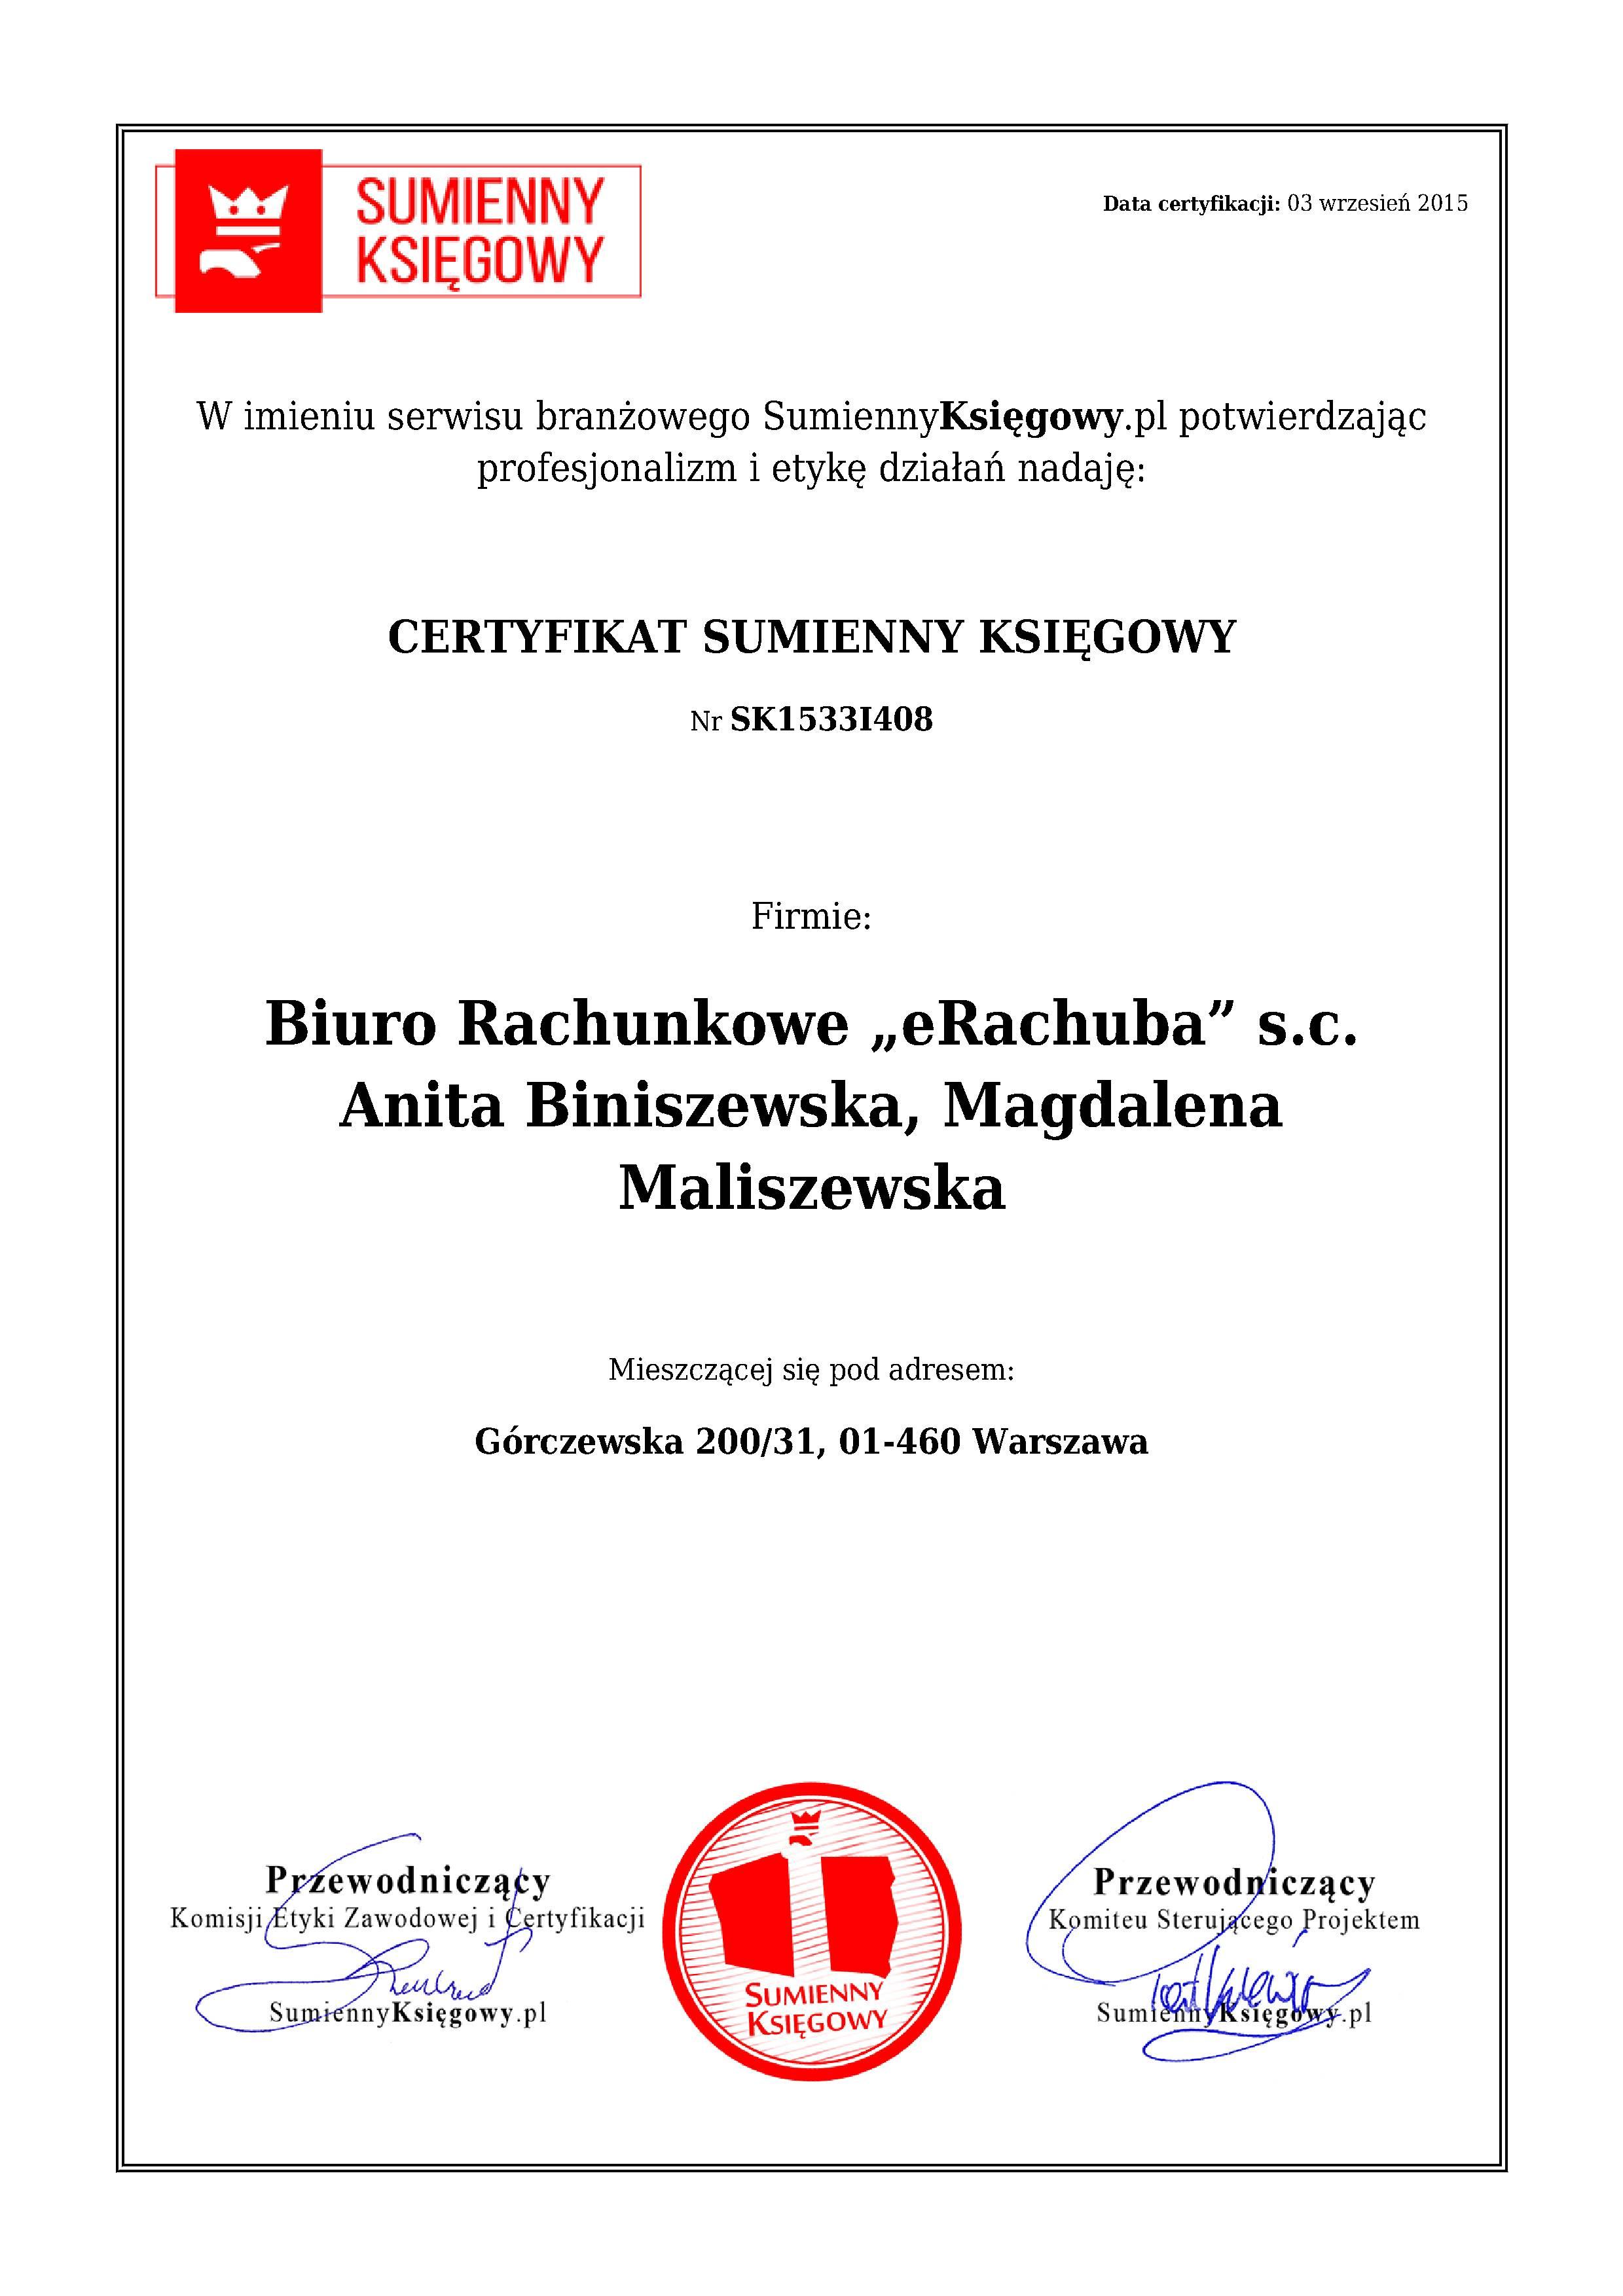 "Certyfikat Biuro Rachunkowe ""eRachuba"" s.c. Anita Biniszewska, Magdalena Maliszewska"